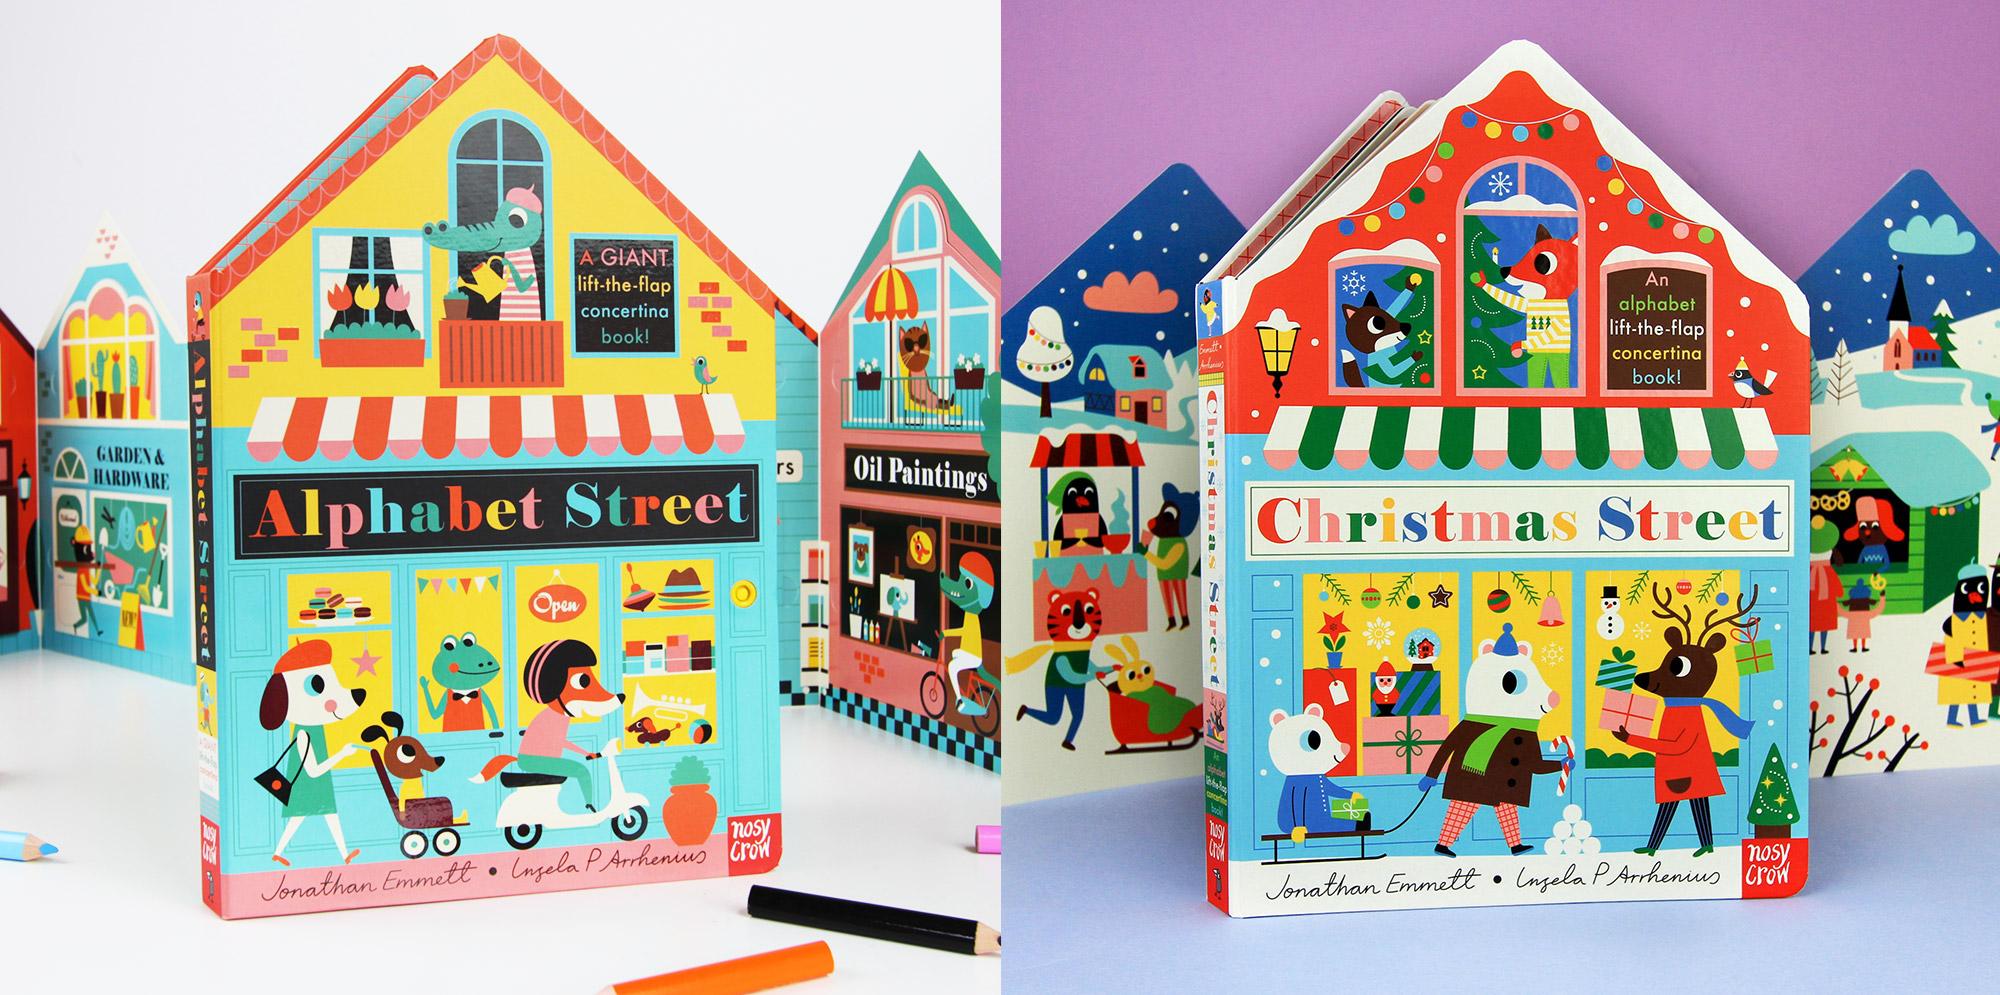 Alphabet Street and Christmas Street by Ingela P Arrhenius and Jonathan Emmett